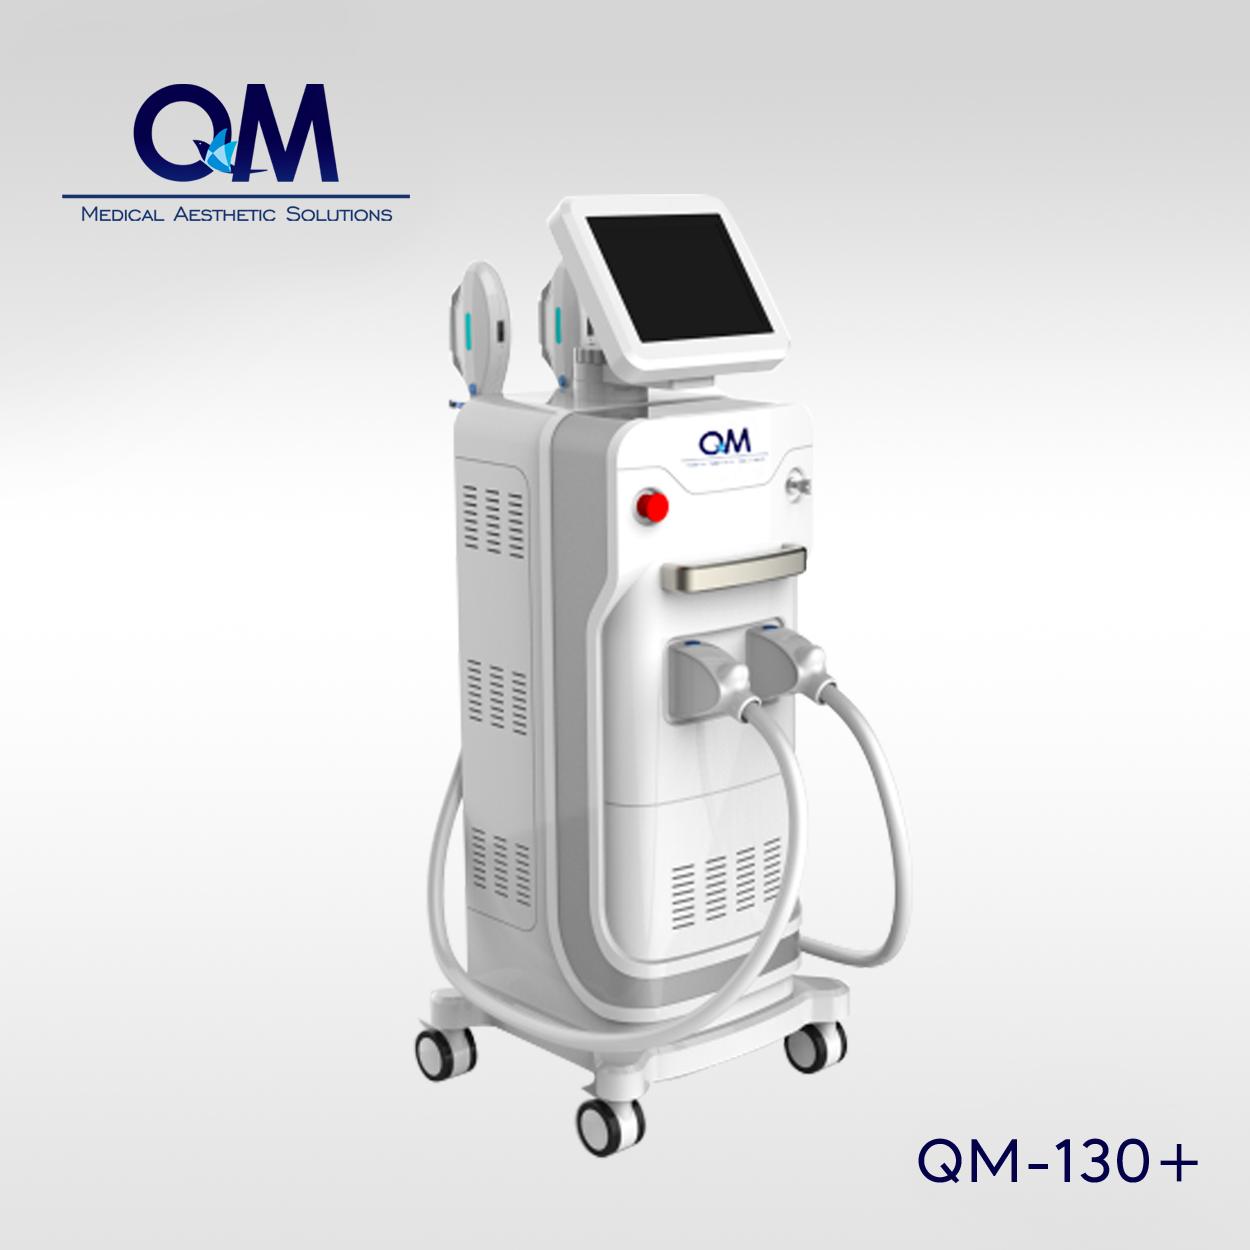 QM-130+